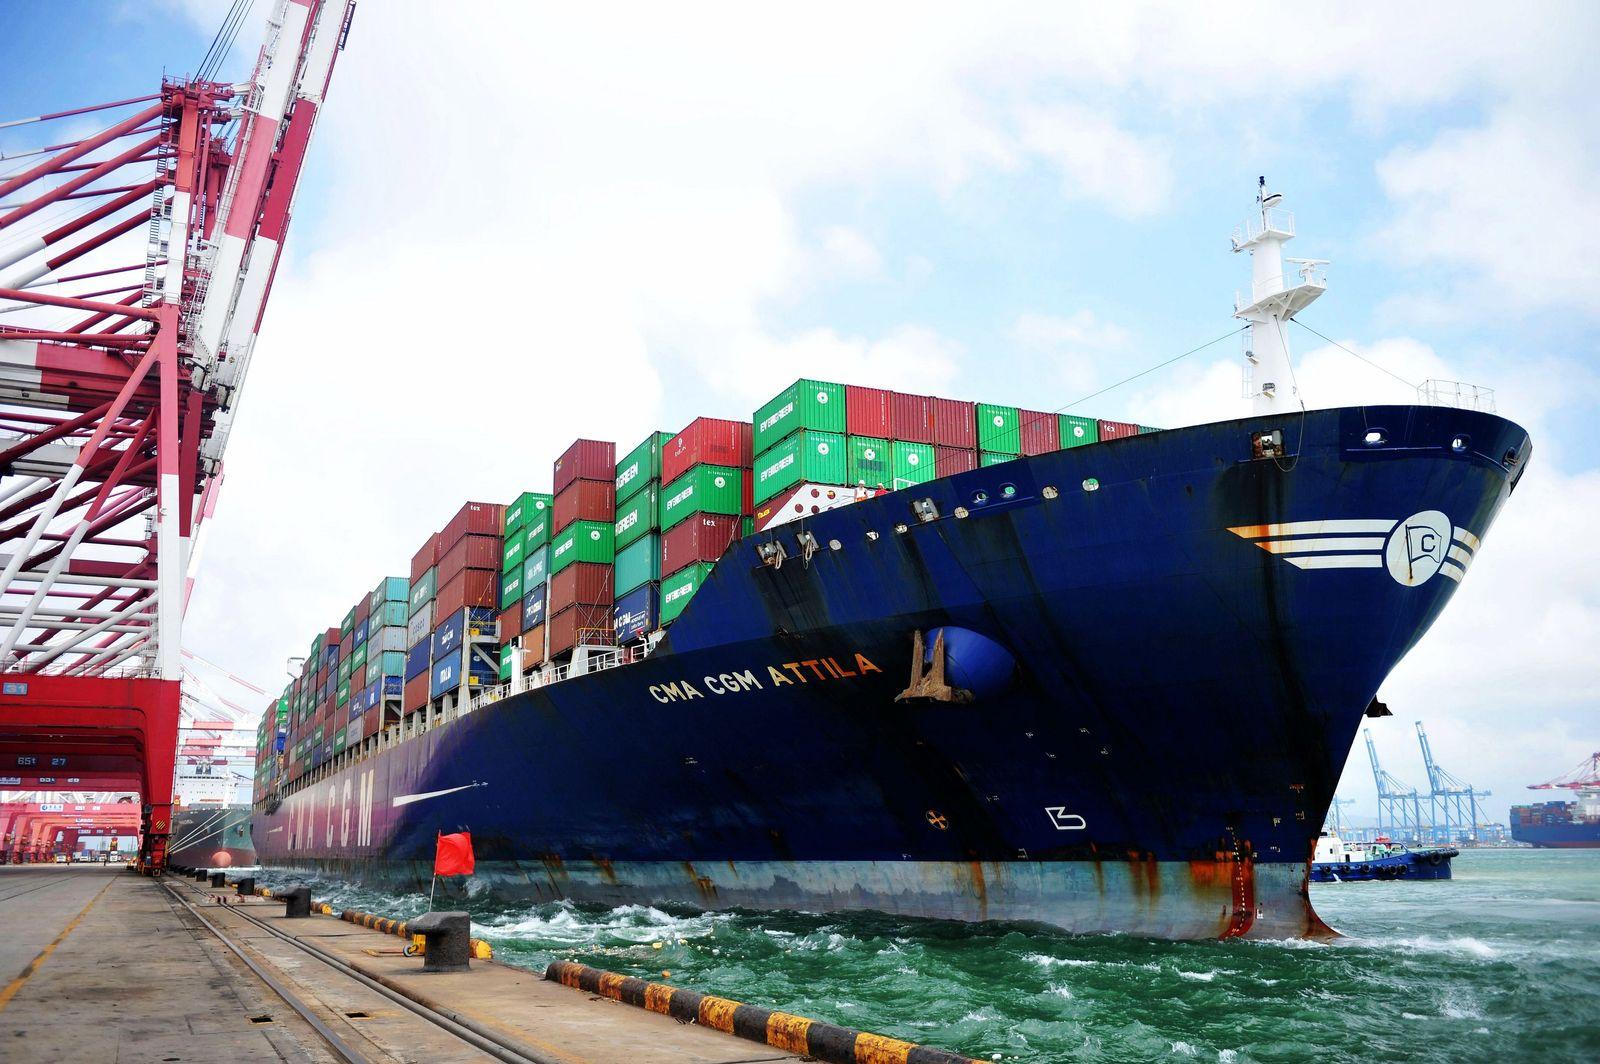 CHINA / IMPORT EXPORT / Konjunktur / Hafen in China / Aussenhandel